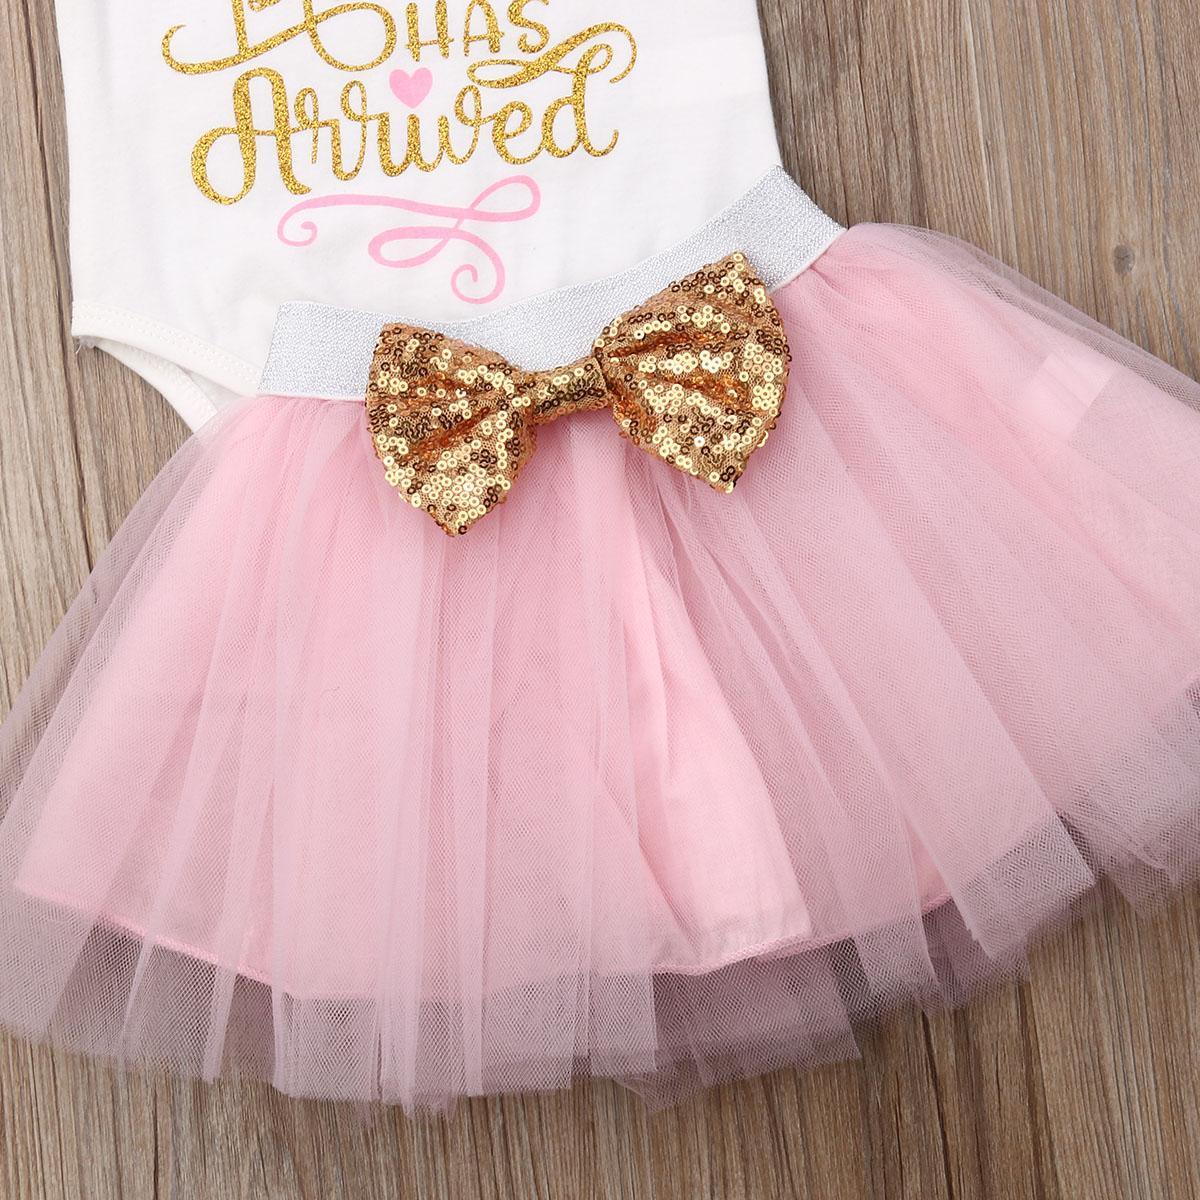 Baby-Kleidung Tutu Tulle Bogen-Rosa-Röcke Buchstabedruck O-Ansatz Kurzarm-Body Kinder Outfits